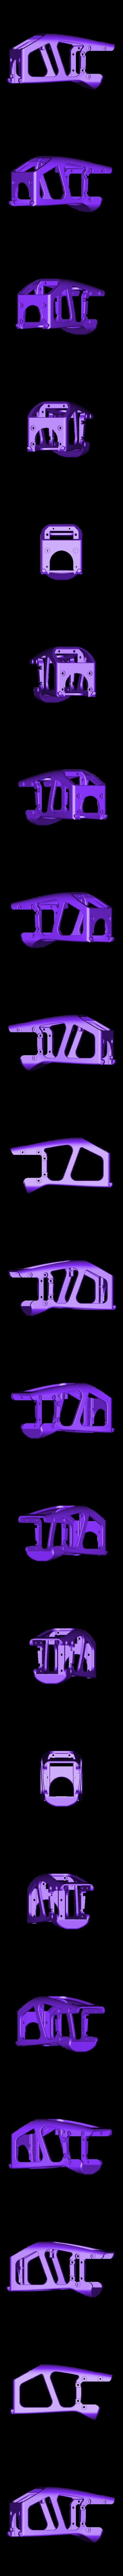 upper_arm.STL Download free STL file Poppy Torso • 3D printable model, PoppyProject